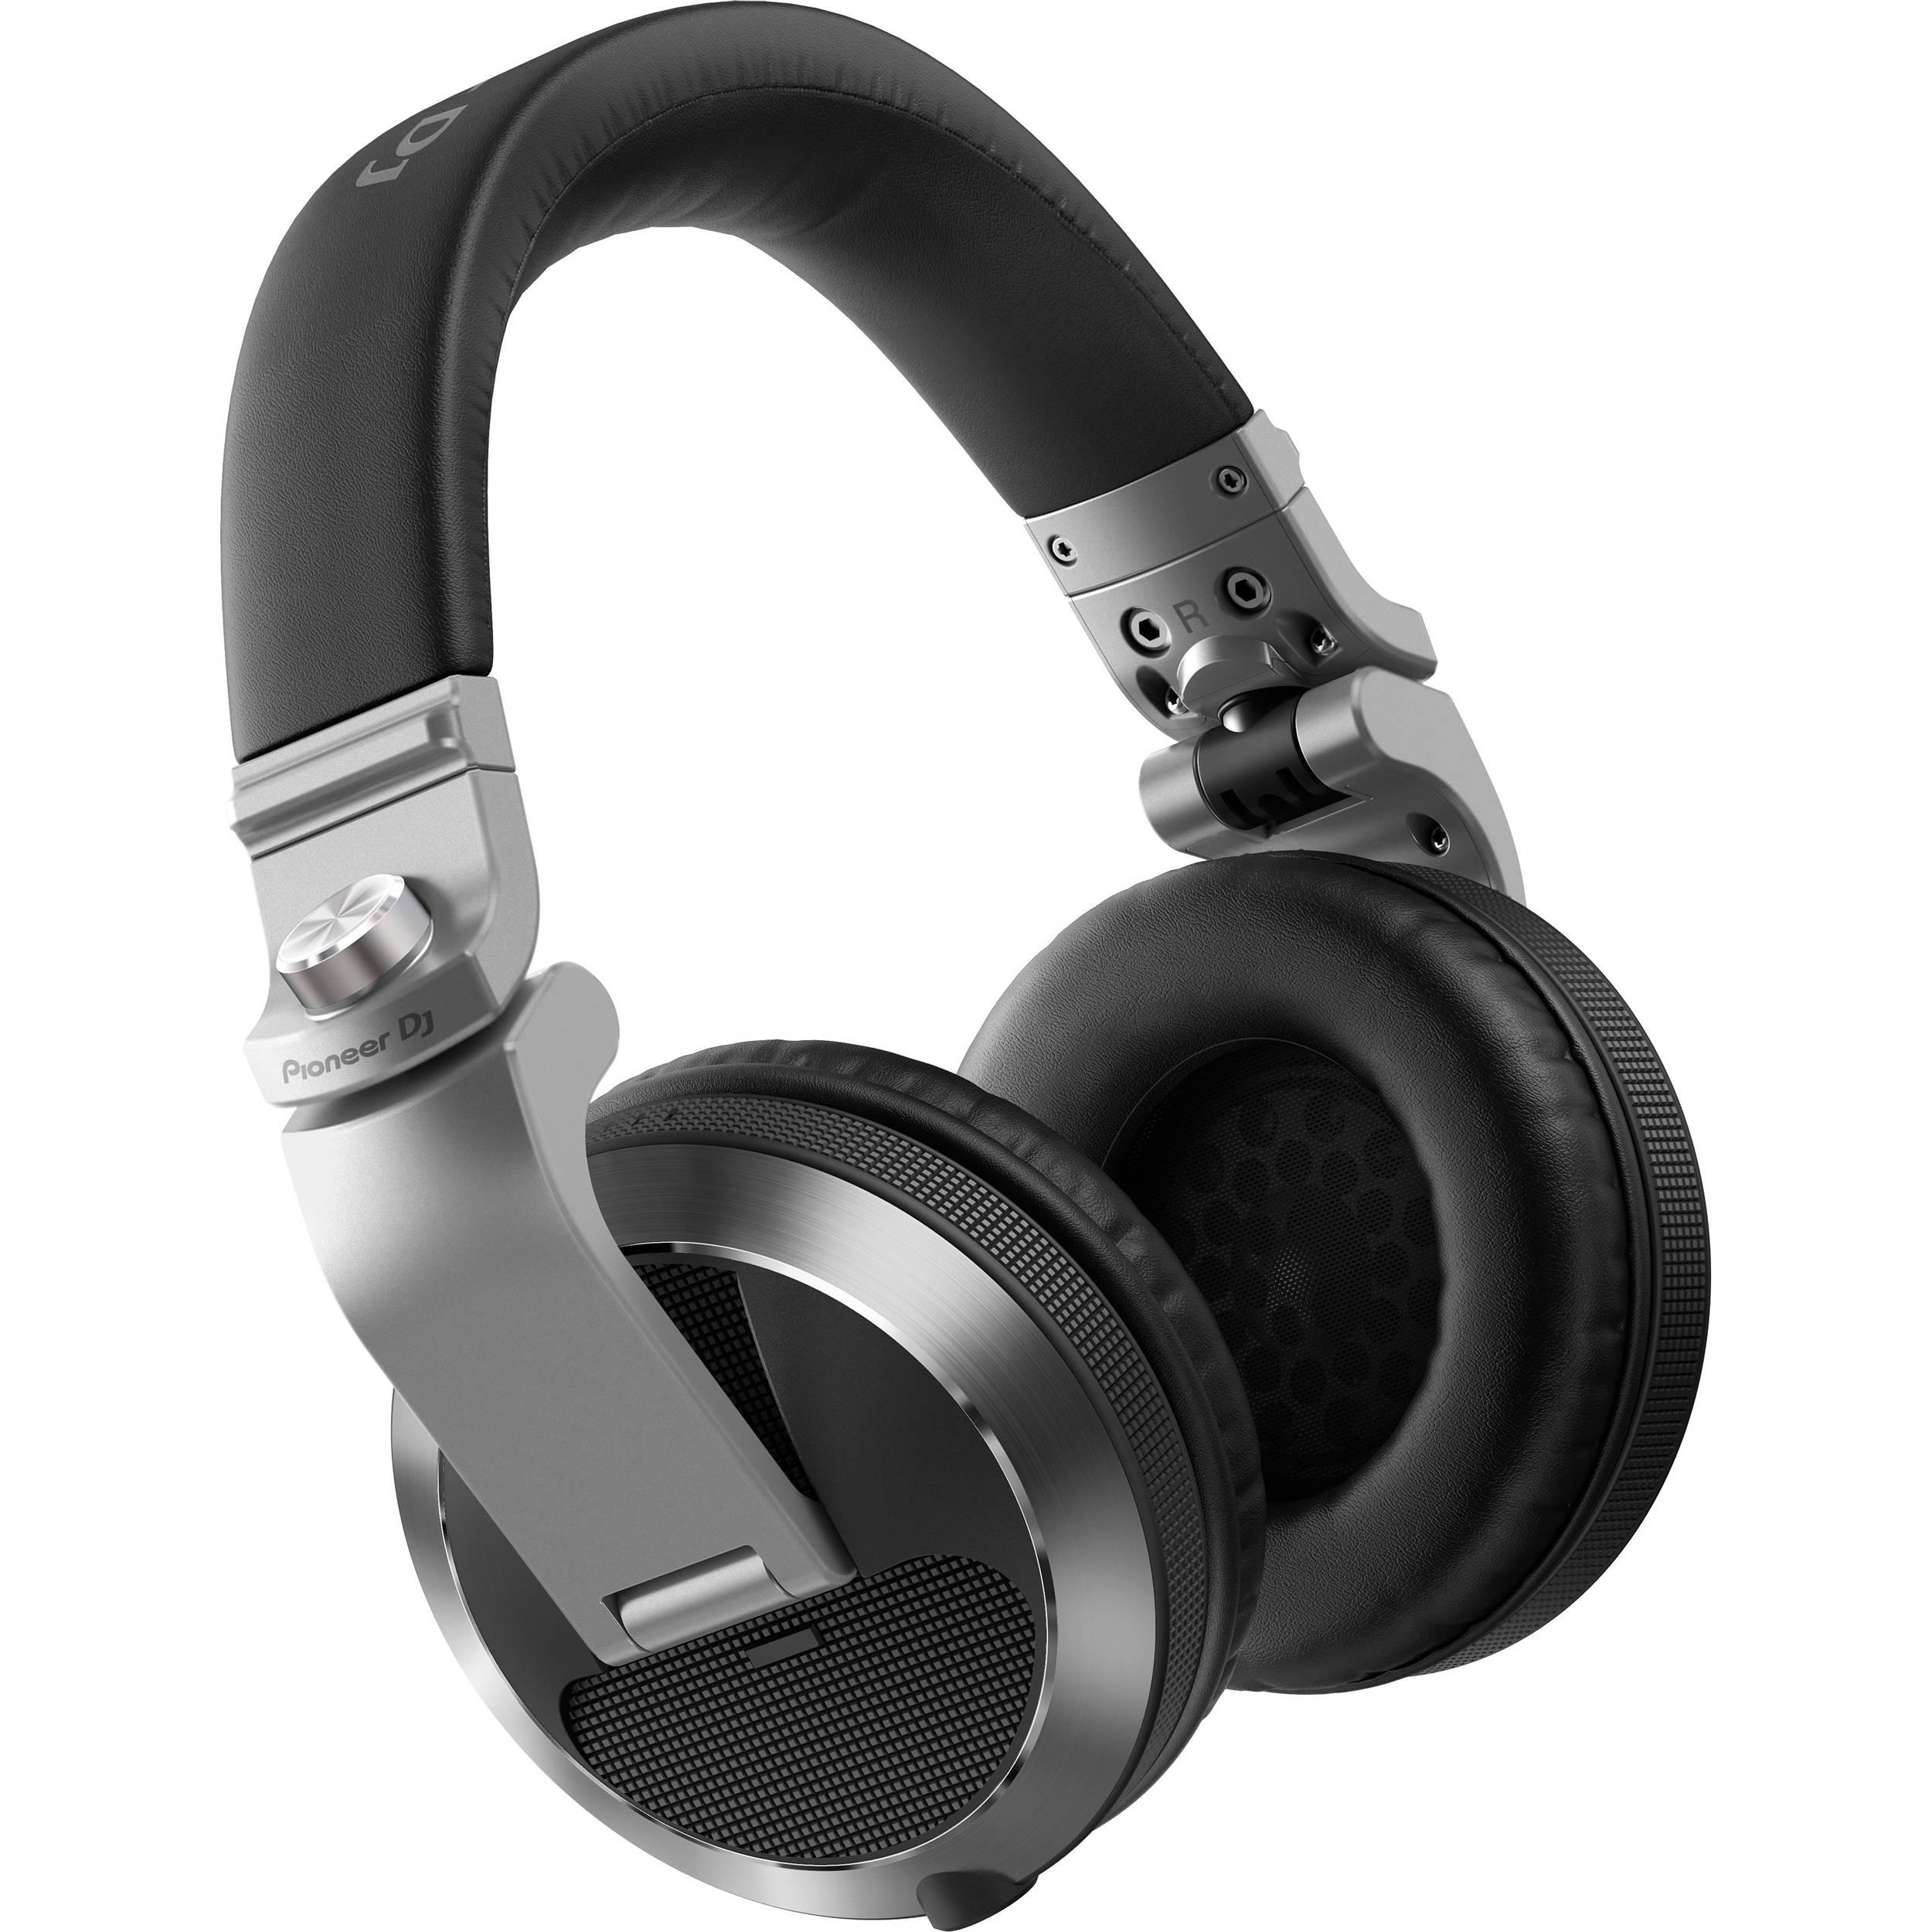 b2e56ec9460 Pioneer DJ HDJ-X7 Professional Over-Ear DJ Headphones (Silver)